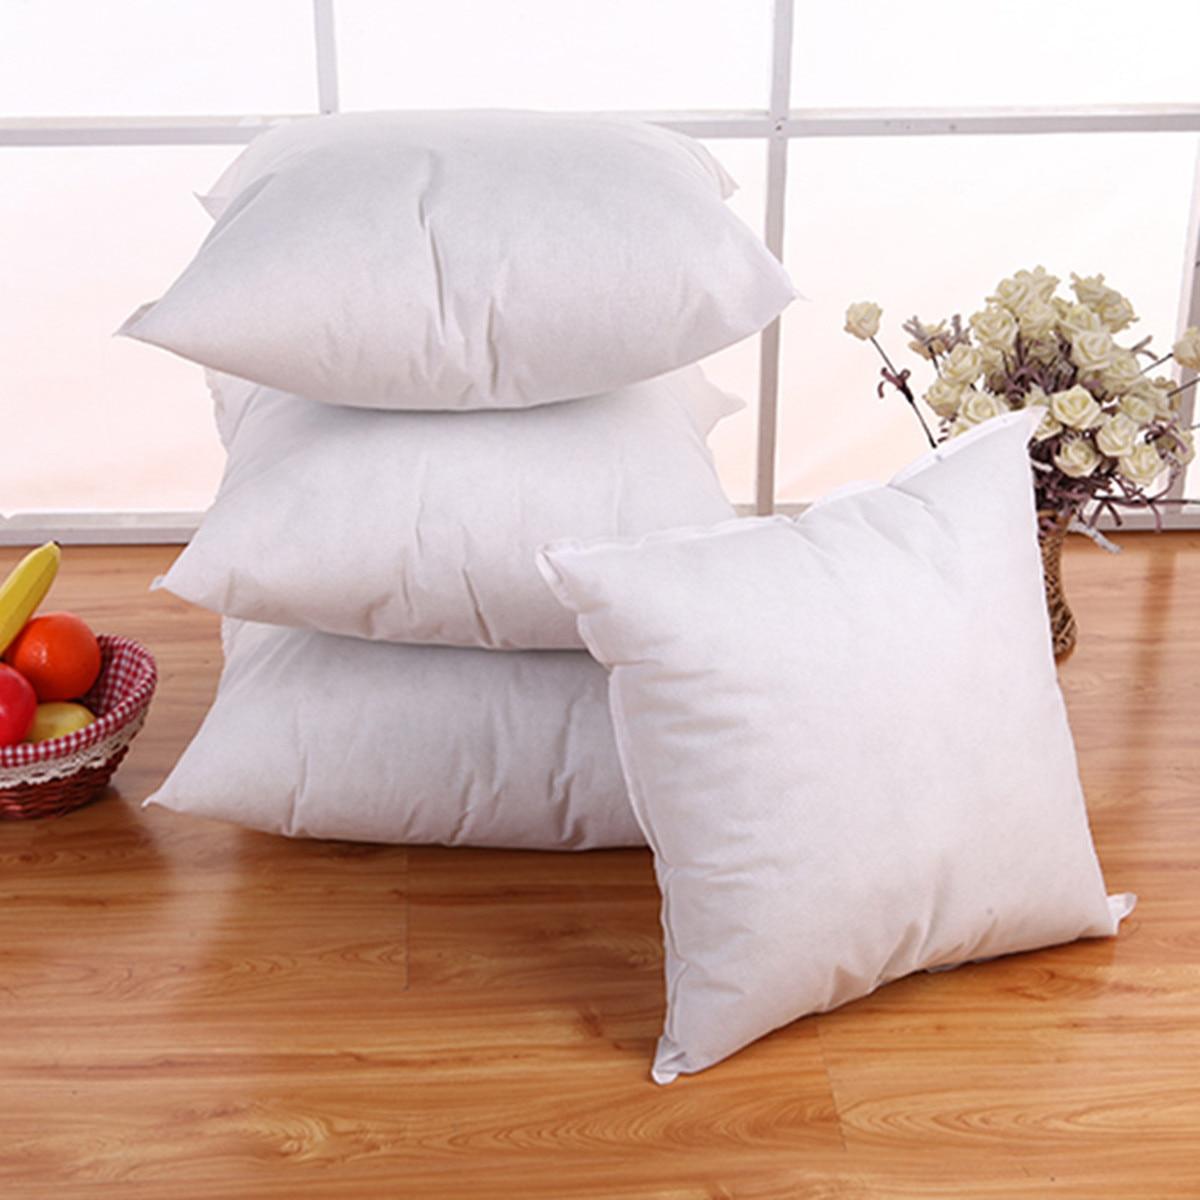 Square White Throw Cushion Pillow Insert Car Seat Waist Pillowcase Inner Filler PP Cotton Filling 5 Size 35 40 45 50 55cm